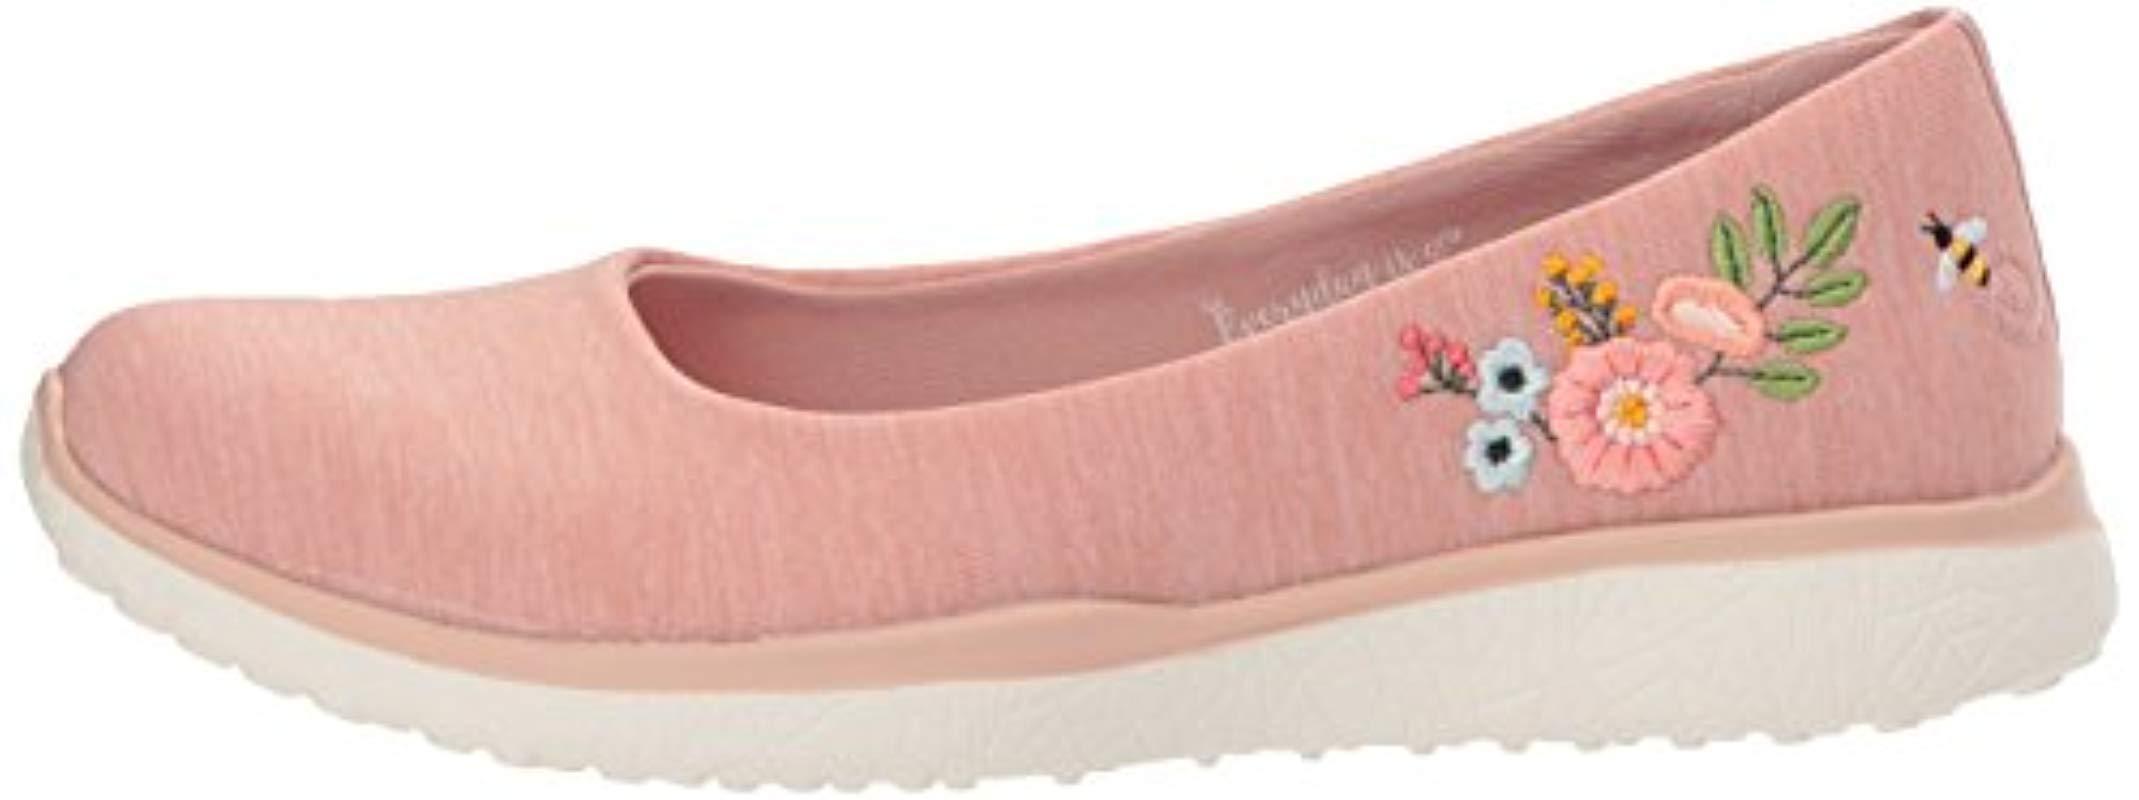 Microburst-Botanical Paradise, Bailarinas con Punta Cerrada para Mujer Skechers de Caucho de color Rosa